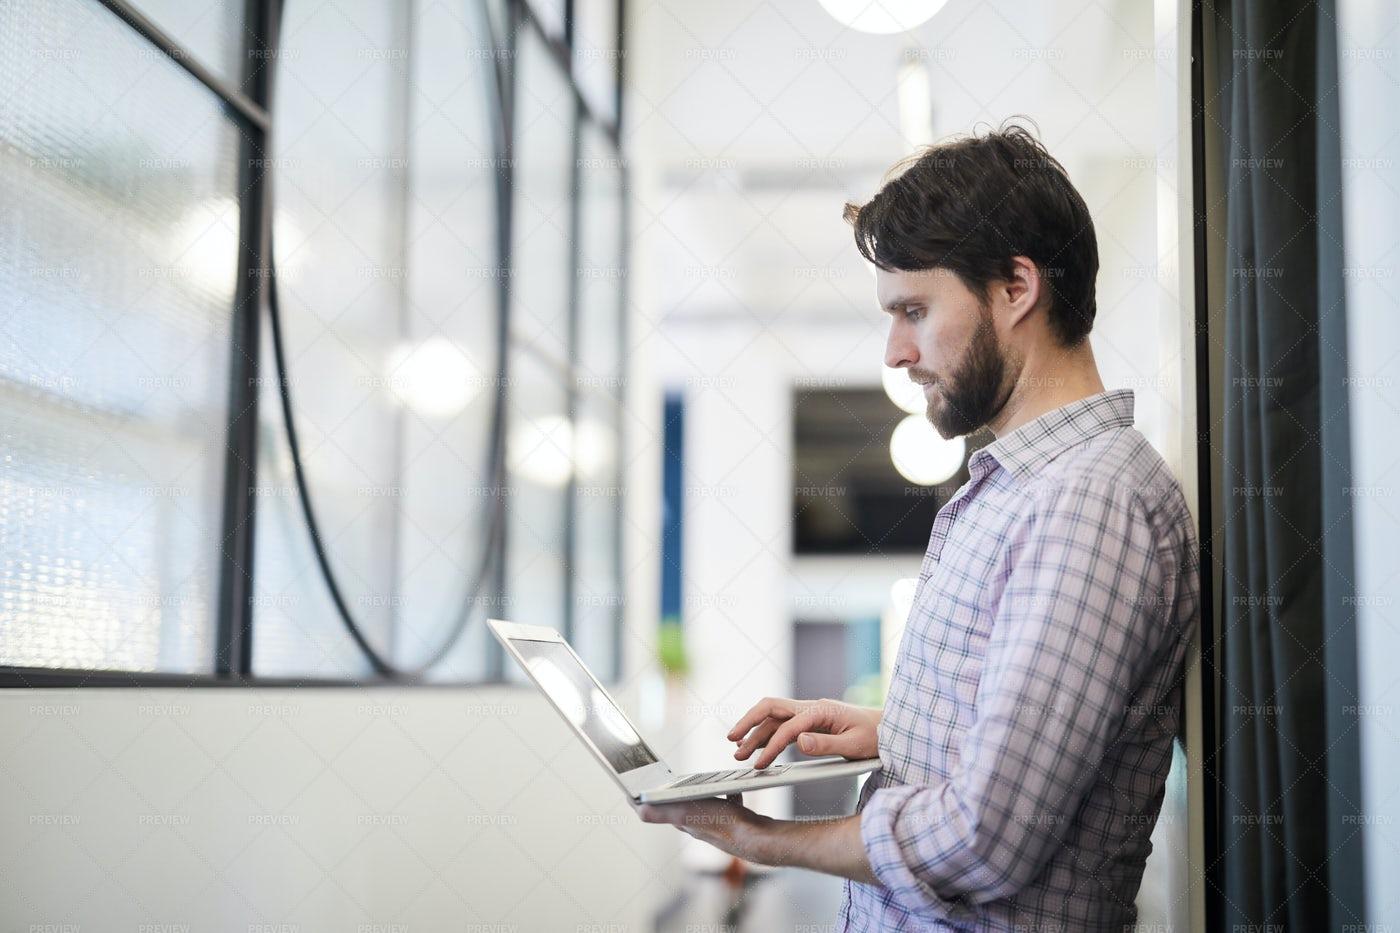 Man Focused On Online Data: Stock Photos